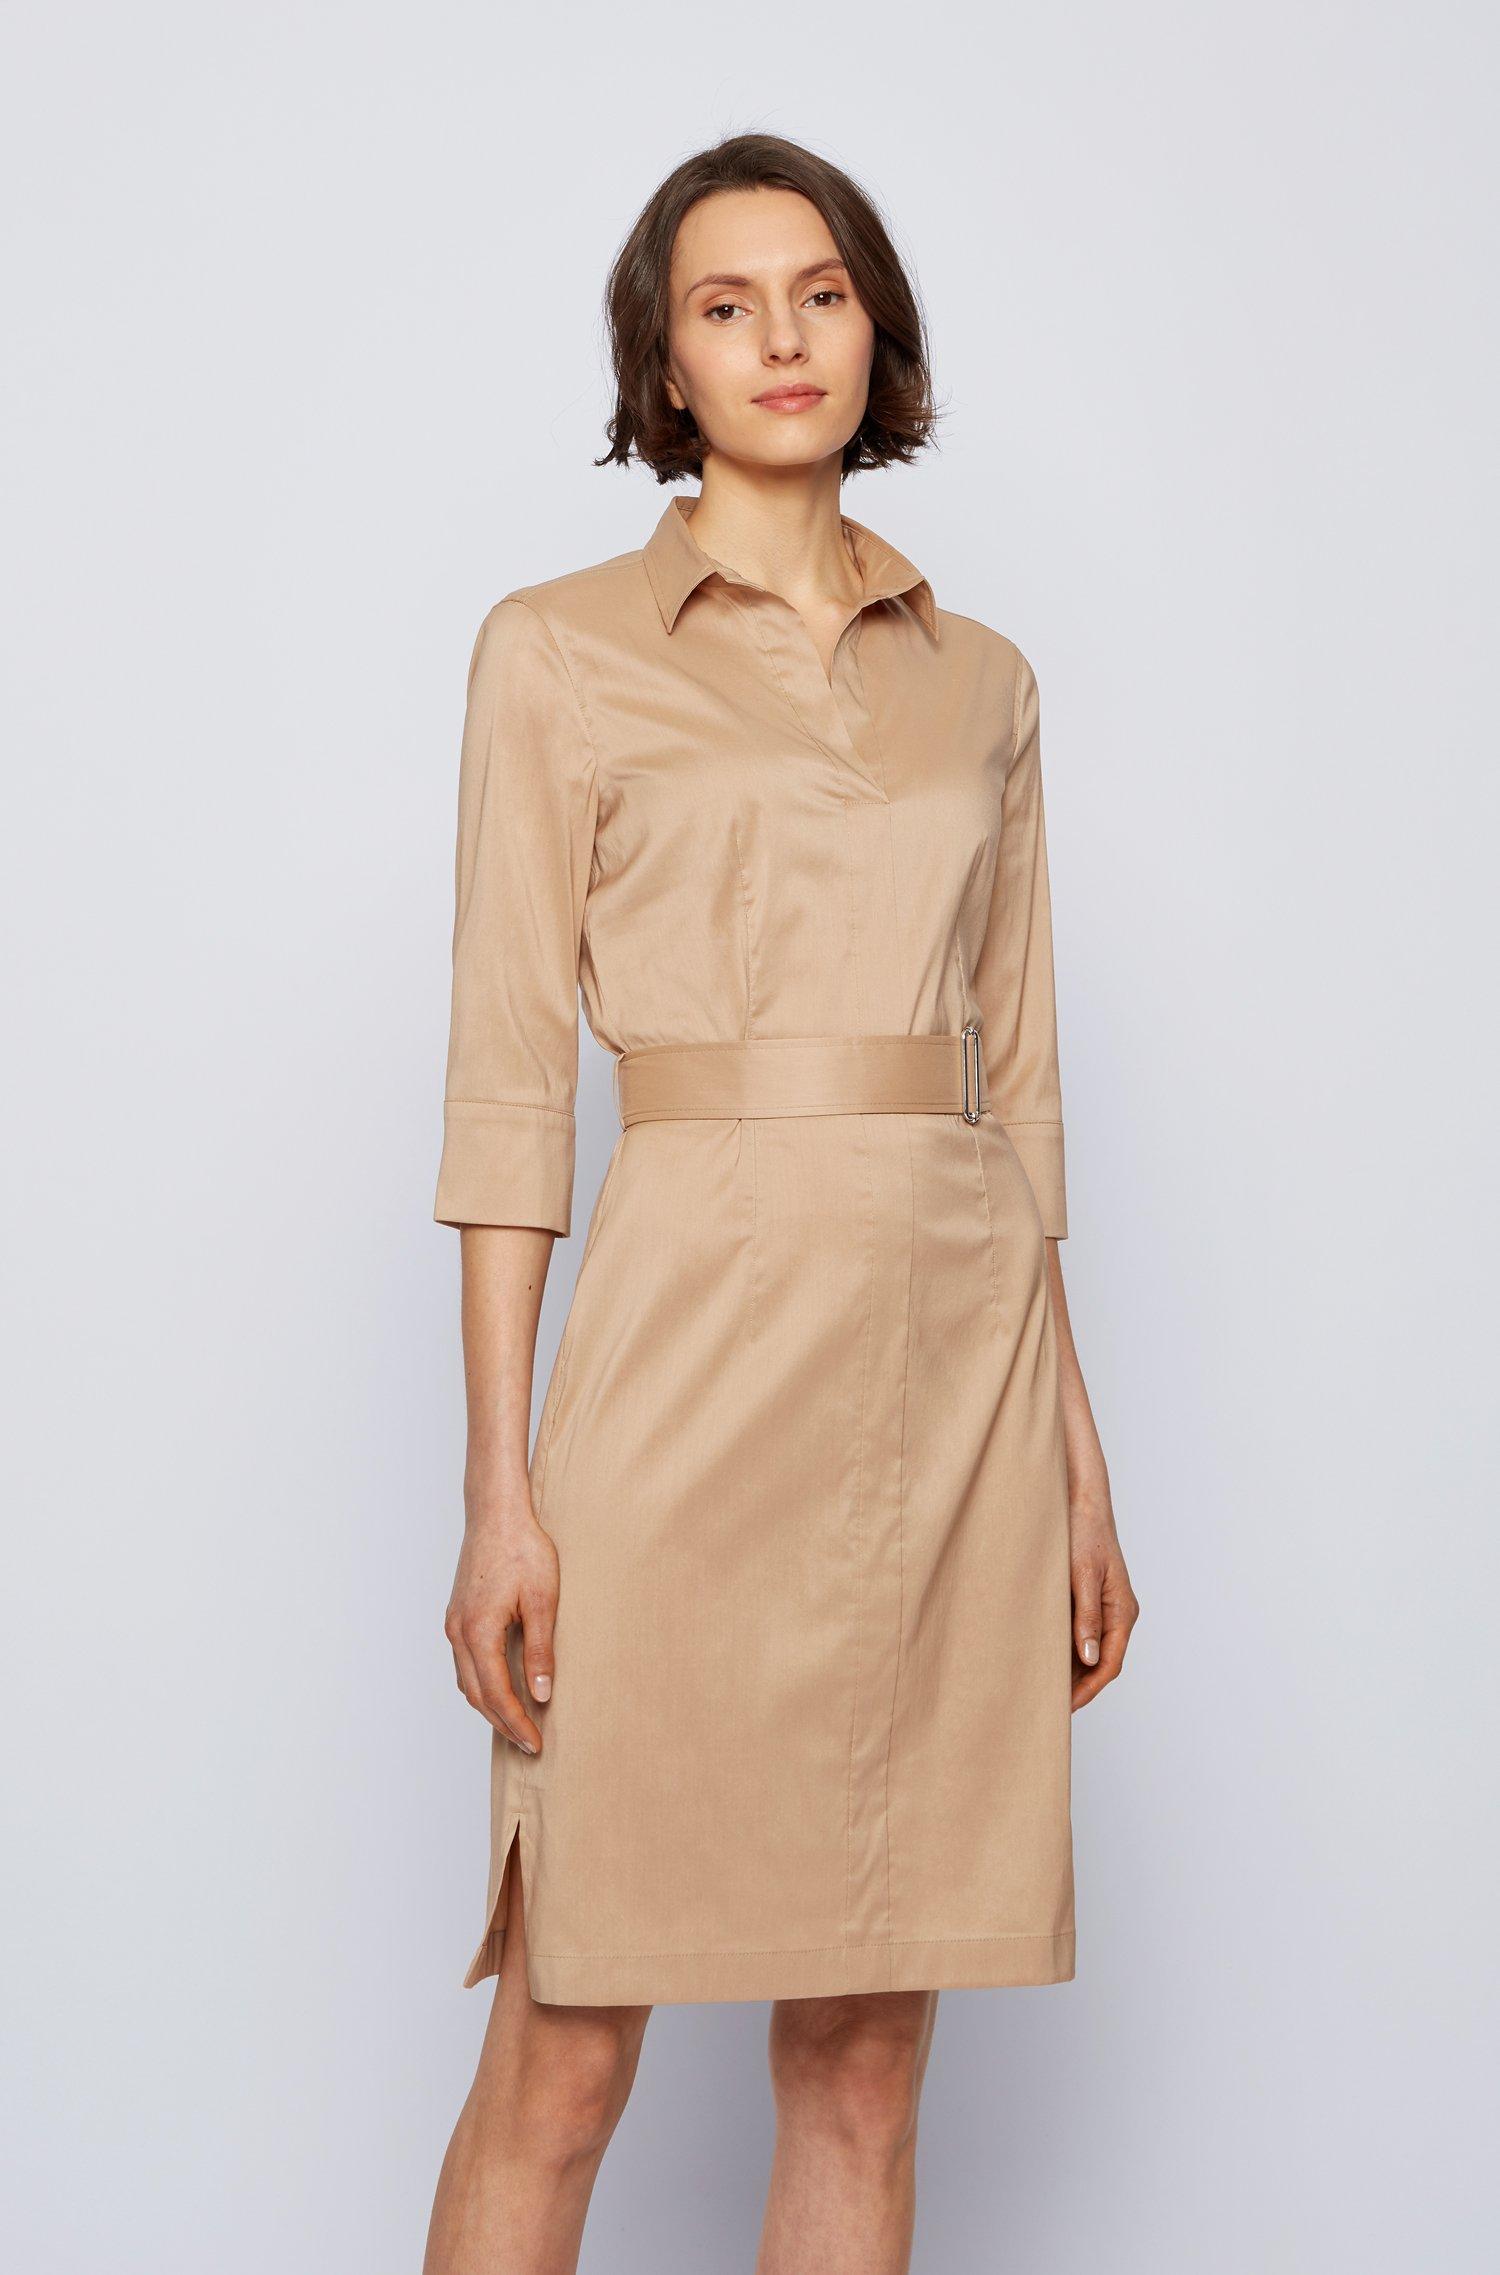 Hemdblusenkleid aus Stretch-Popeline im Trenchcoat-Stil, Beige